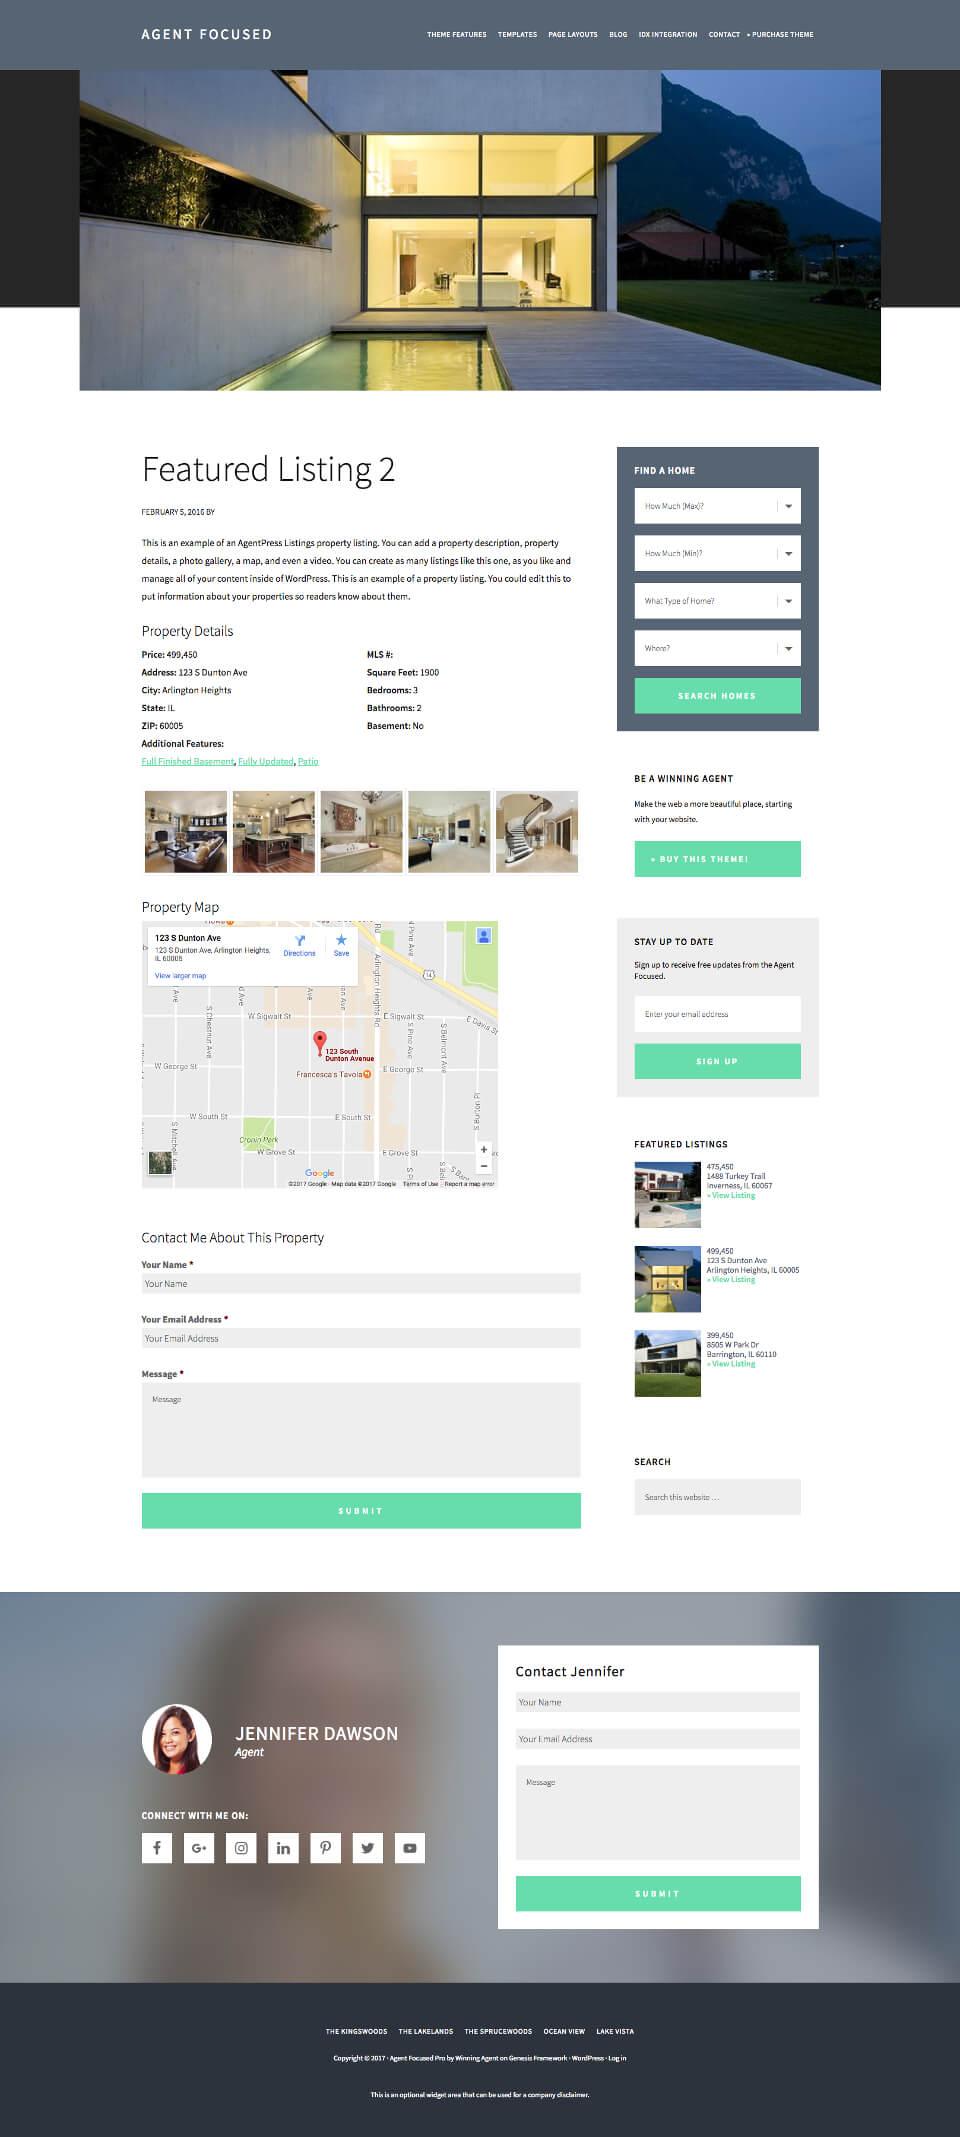 custom studiopress theme for real estate listings agent focused theme